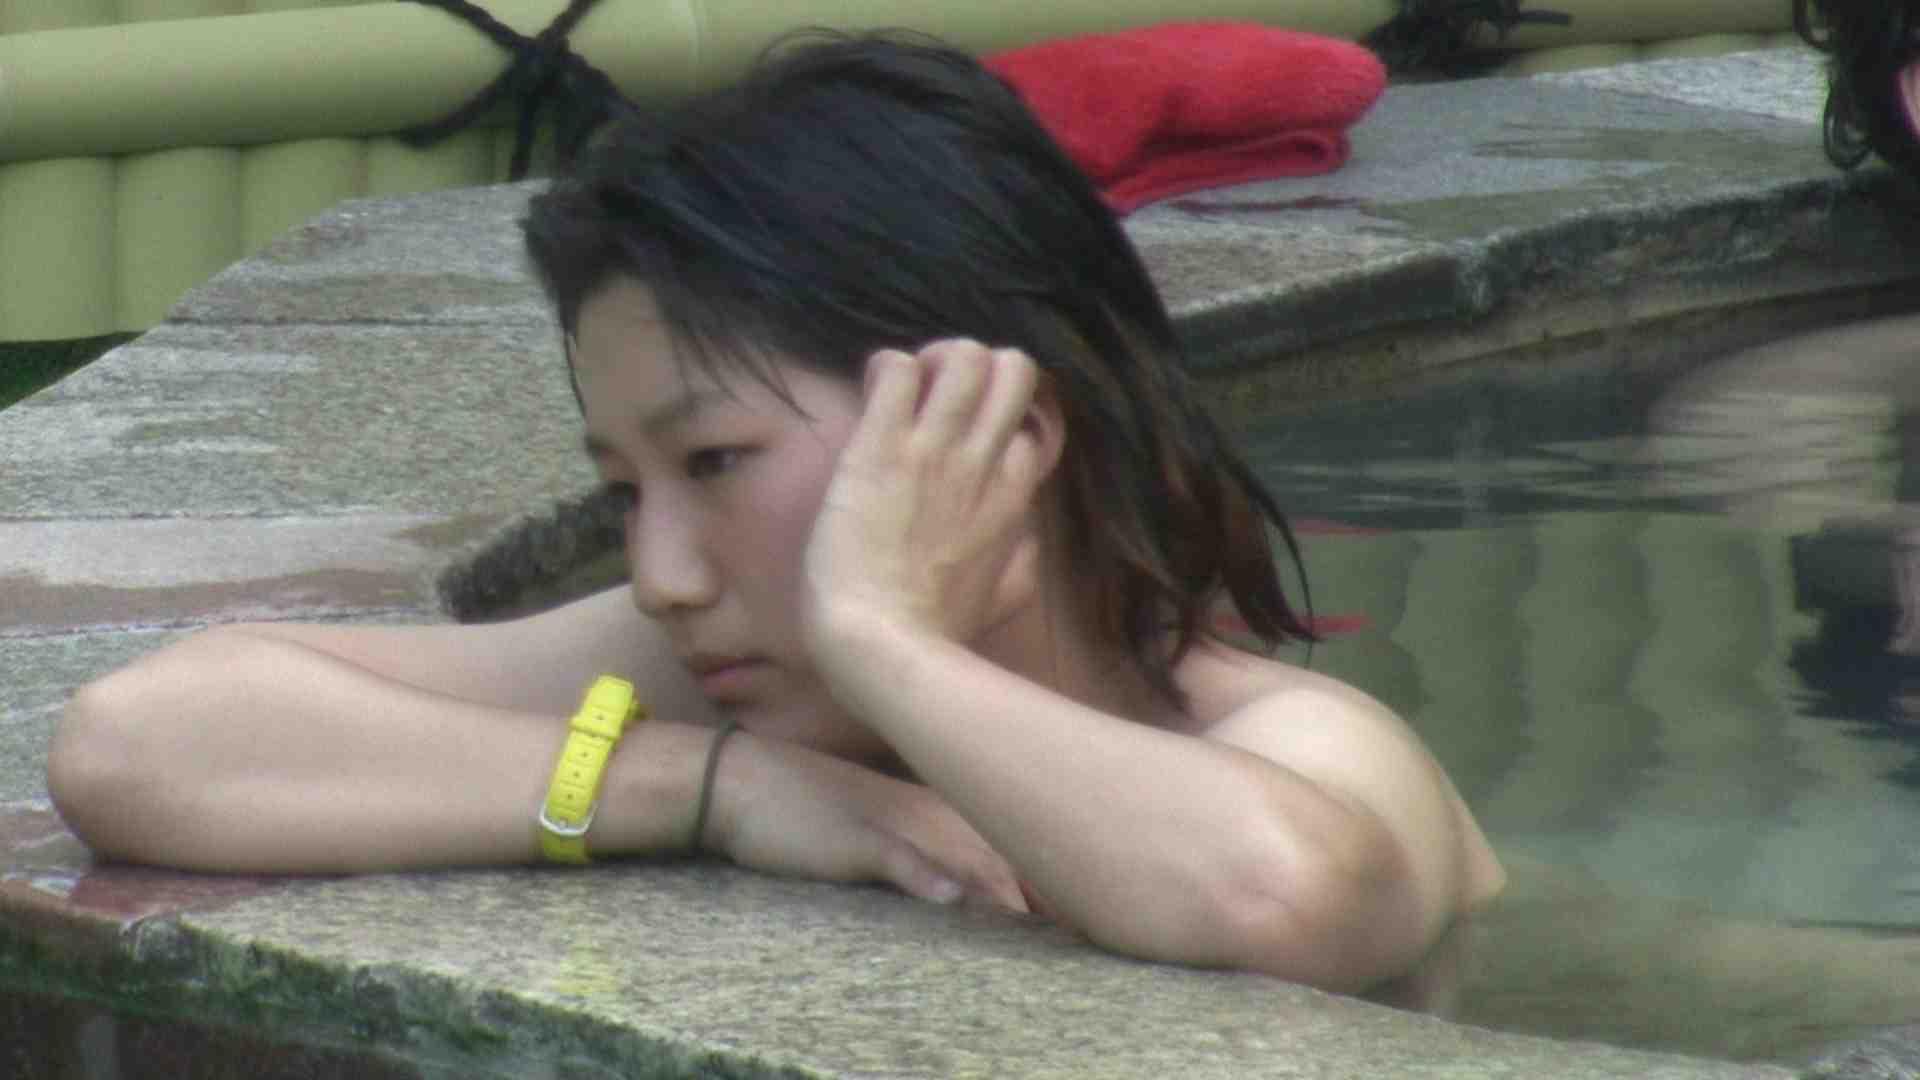 Aquaな露天風呂Vol.132 露天風呂編  78PIX 72